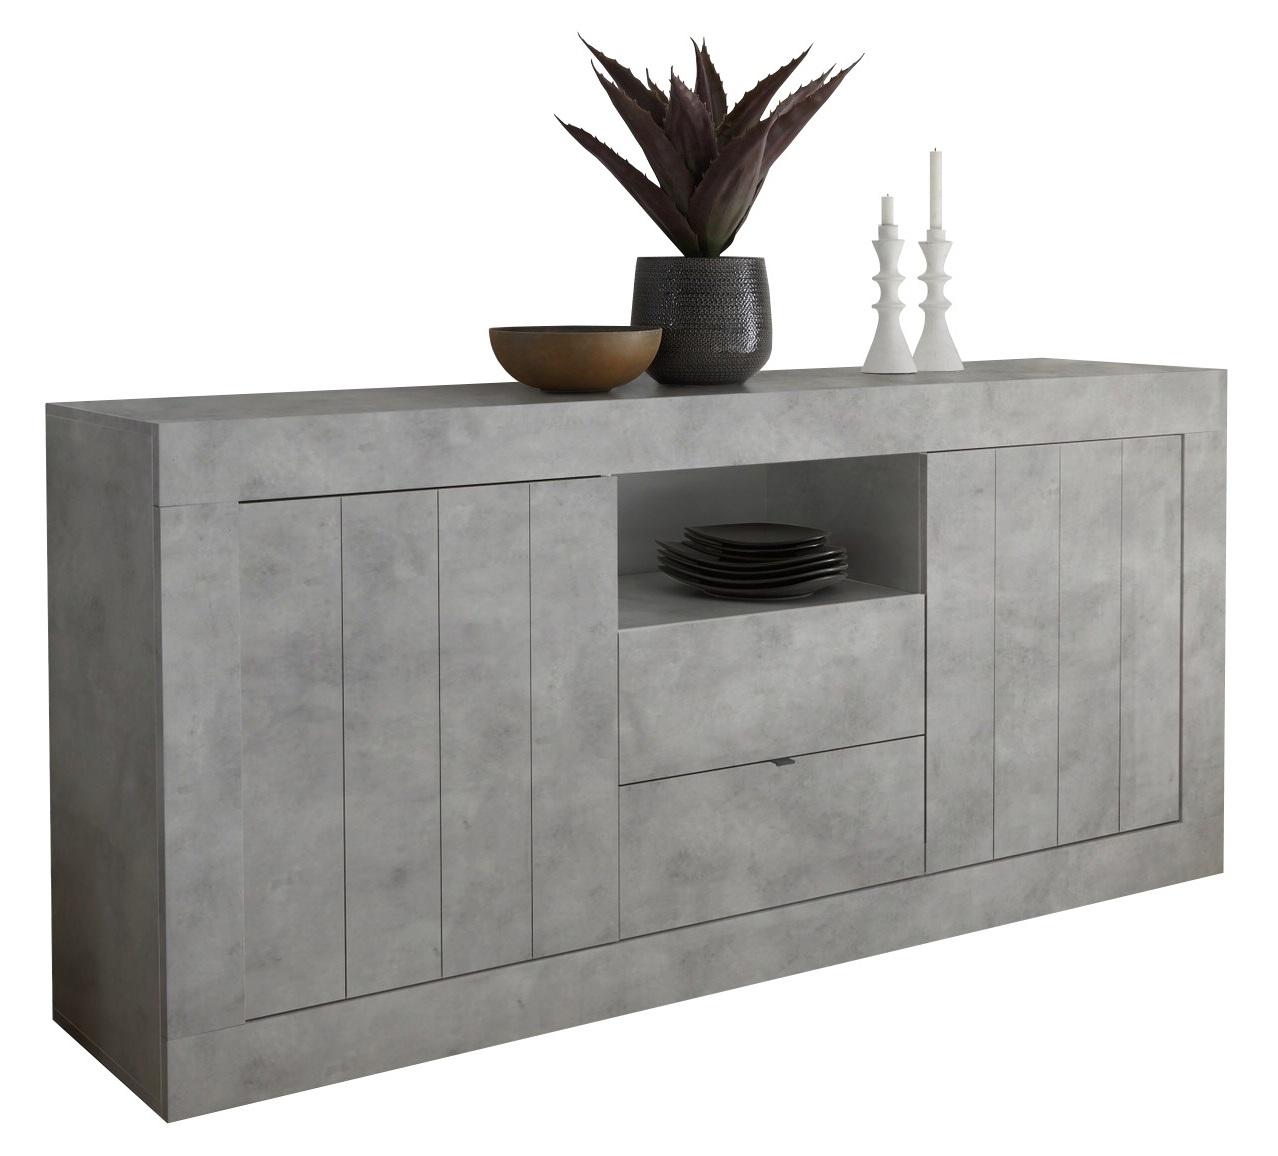 Dressoir Urbino 184 cm breed in grijs beton   Pesaro Mobilia